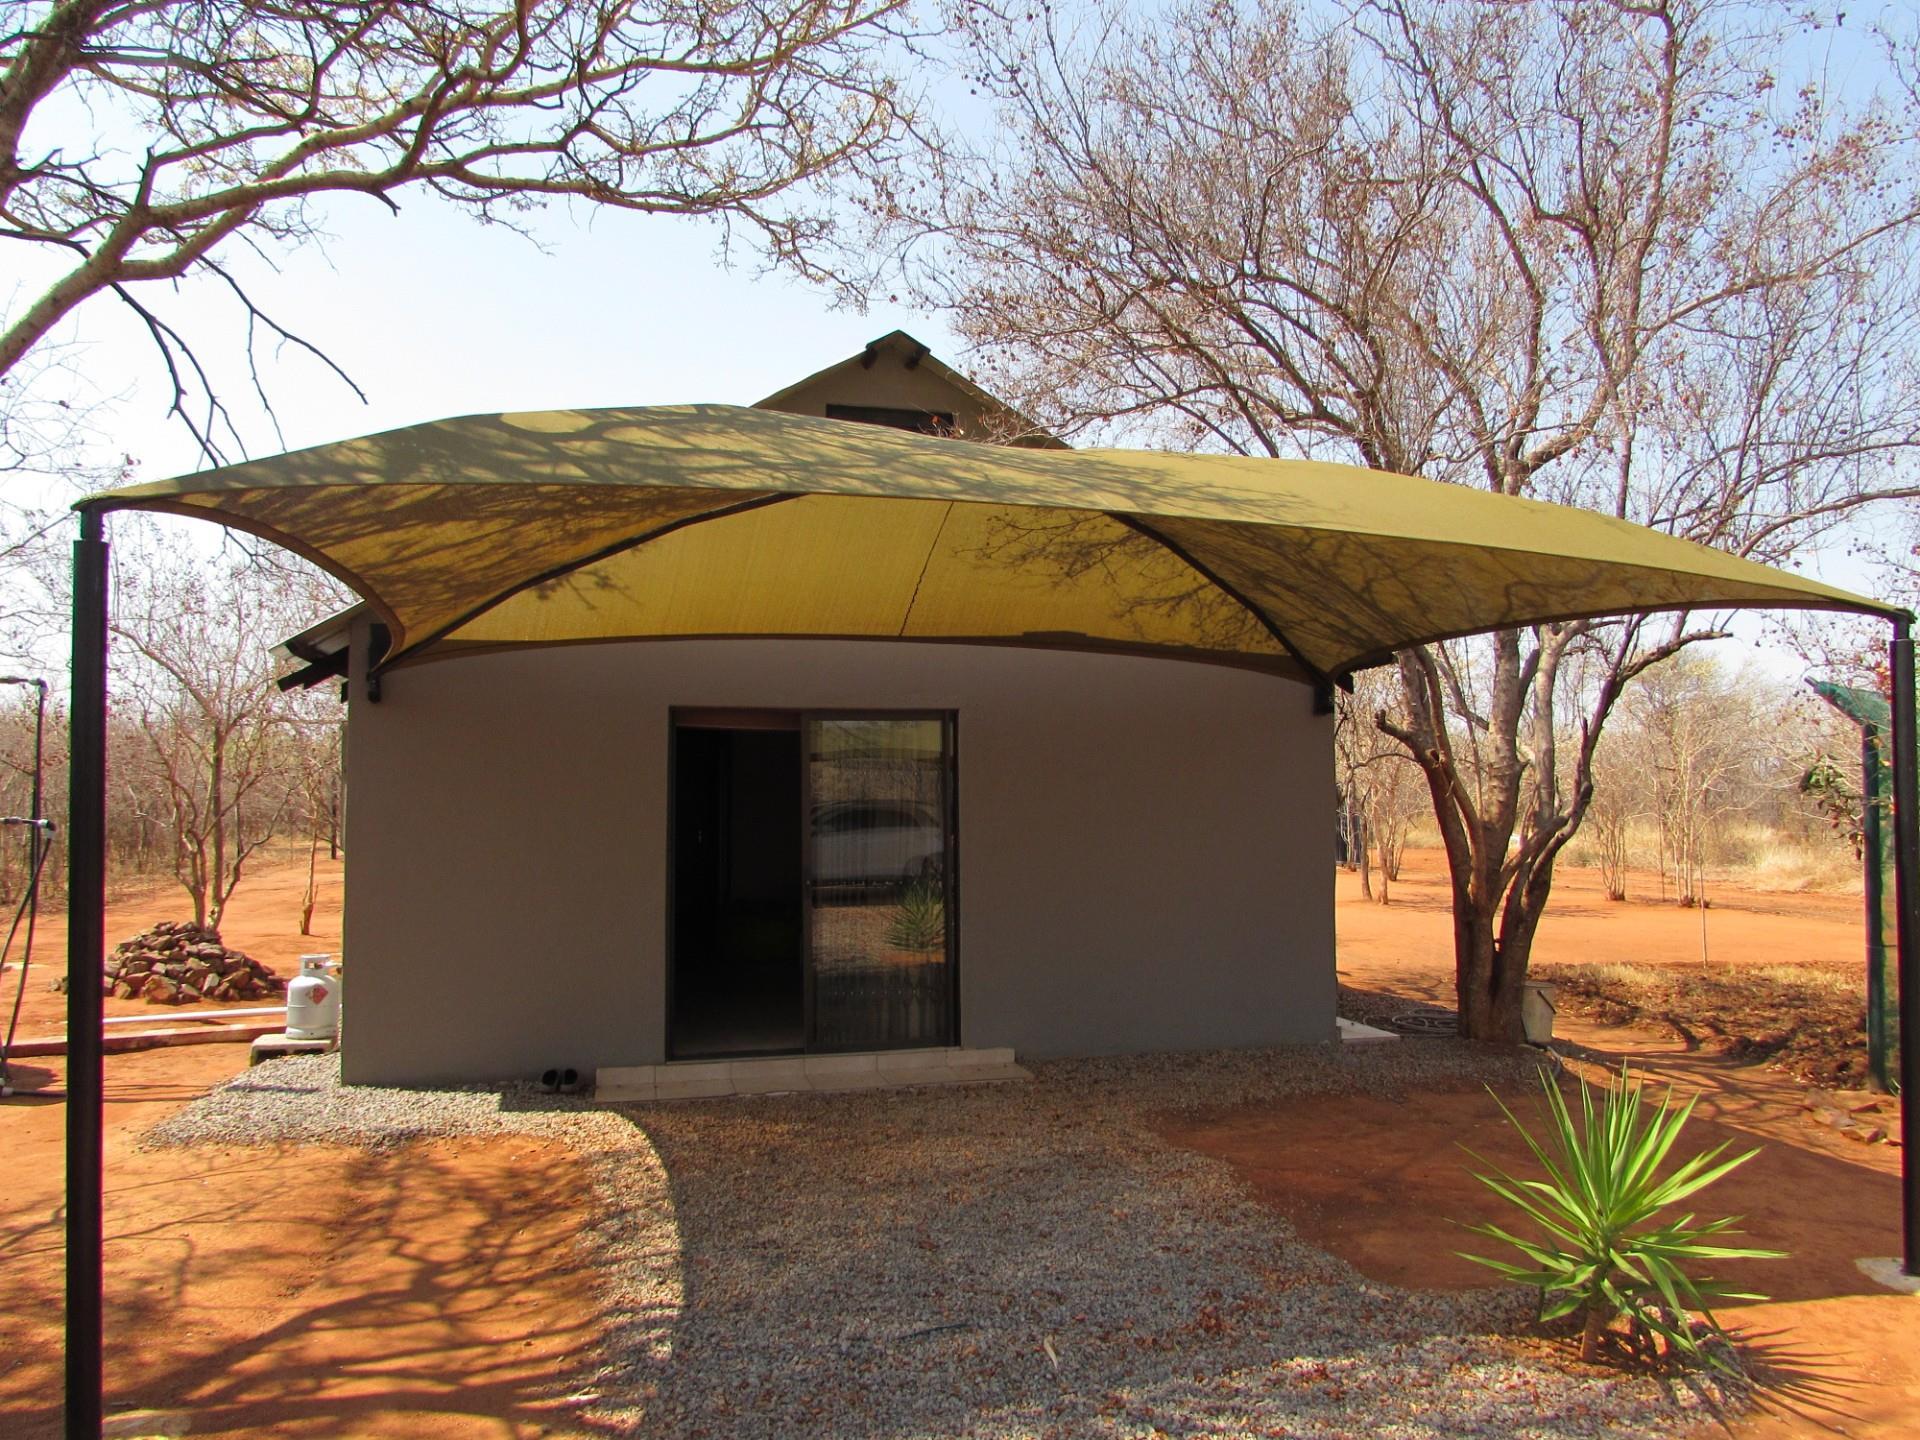 1 Bedroom House For Sale in Mochudi Central